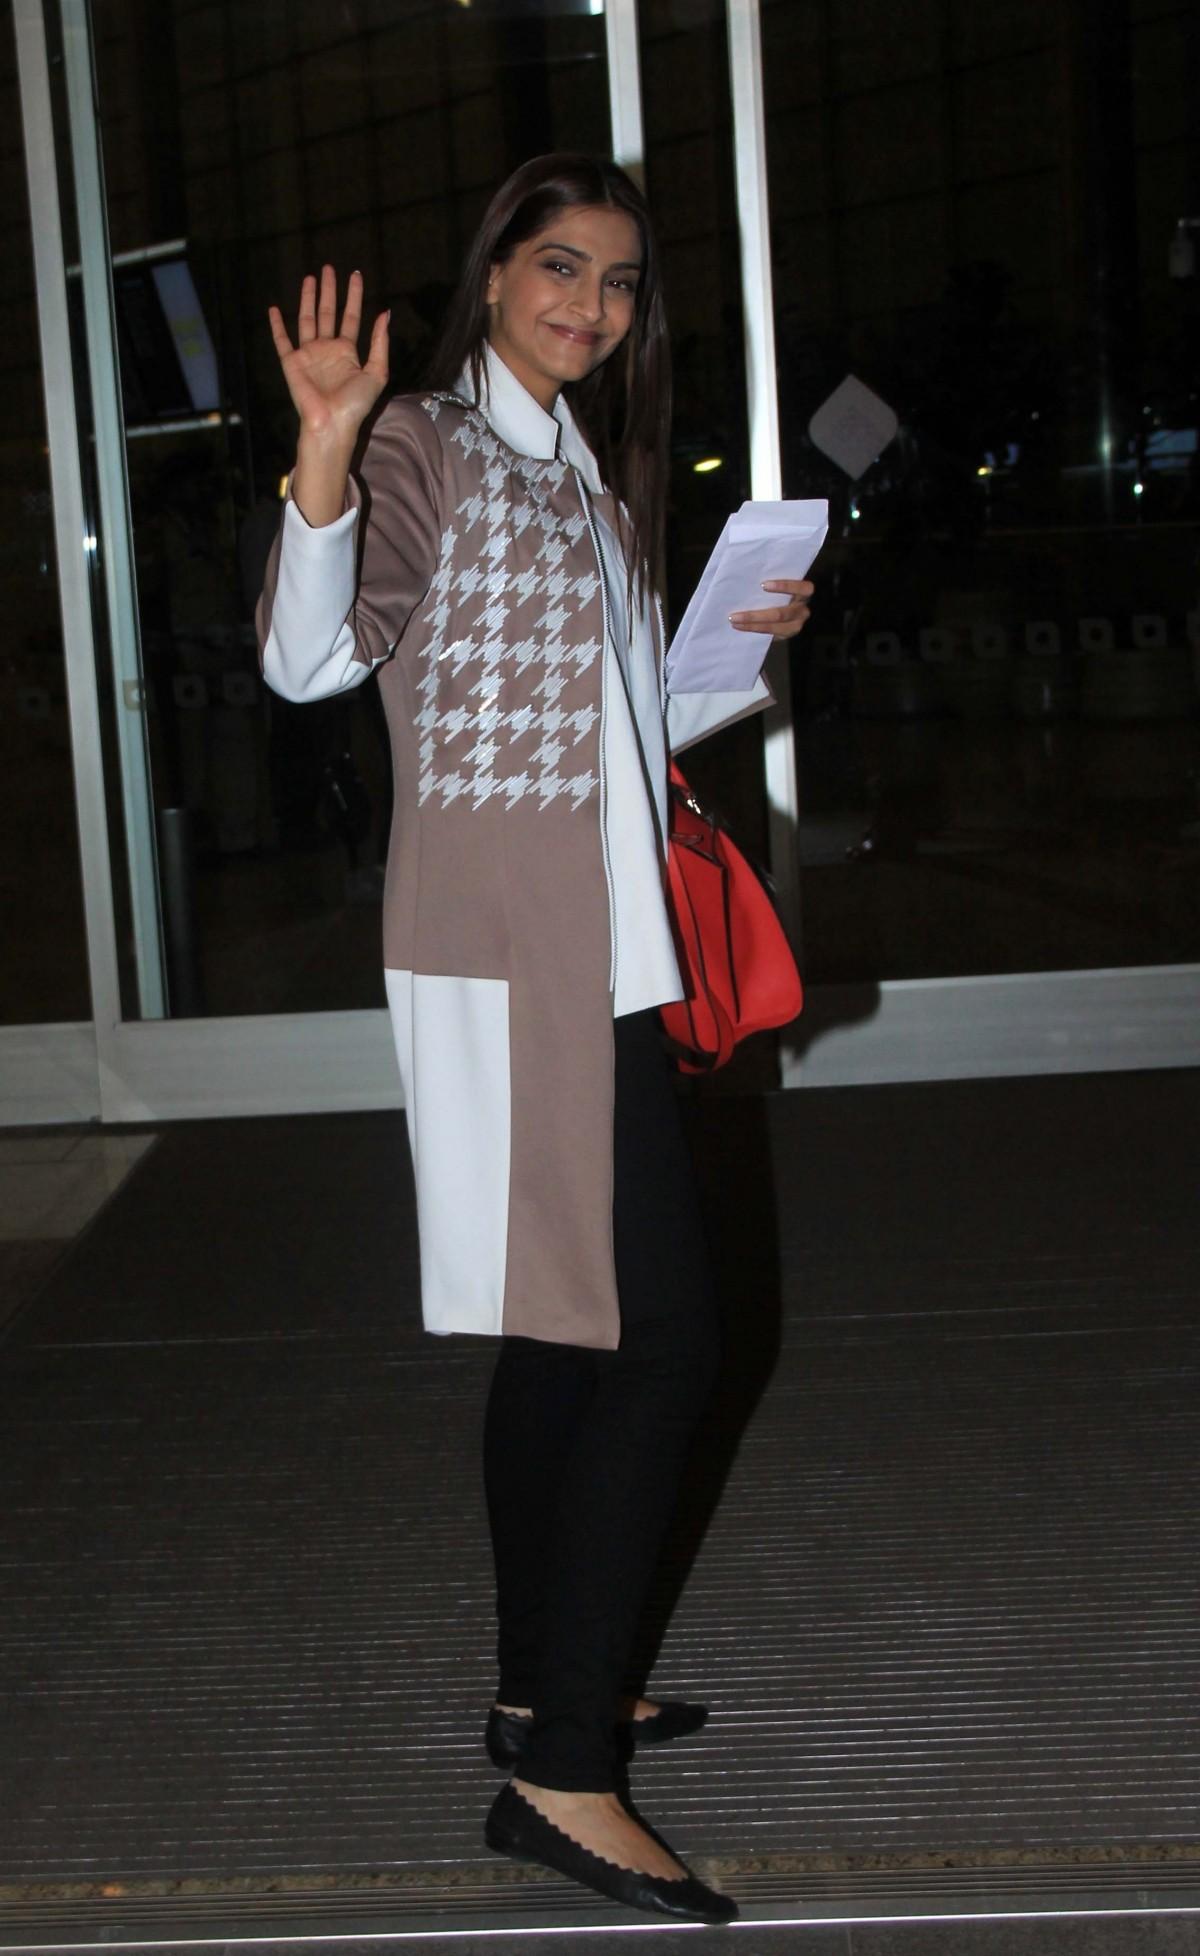 Aishwarya Rai Bachchan, Sonam Kapoor Leaves For Cannes